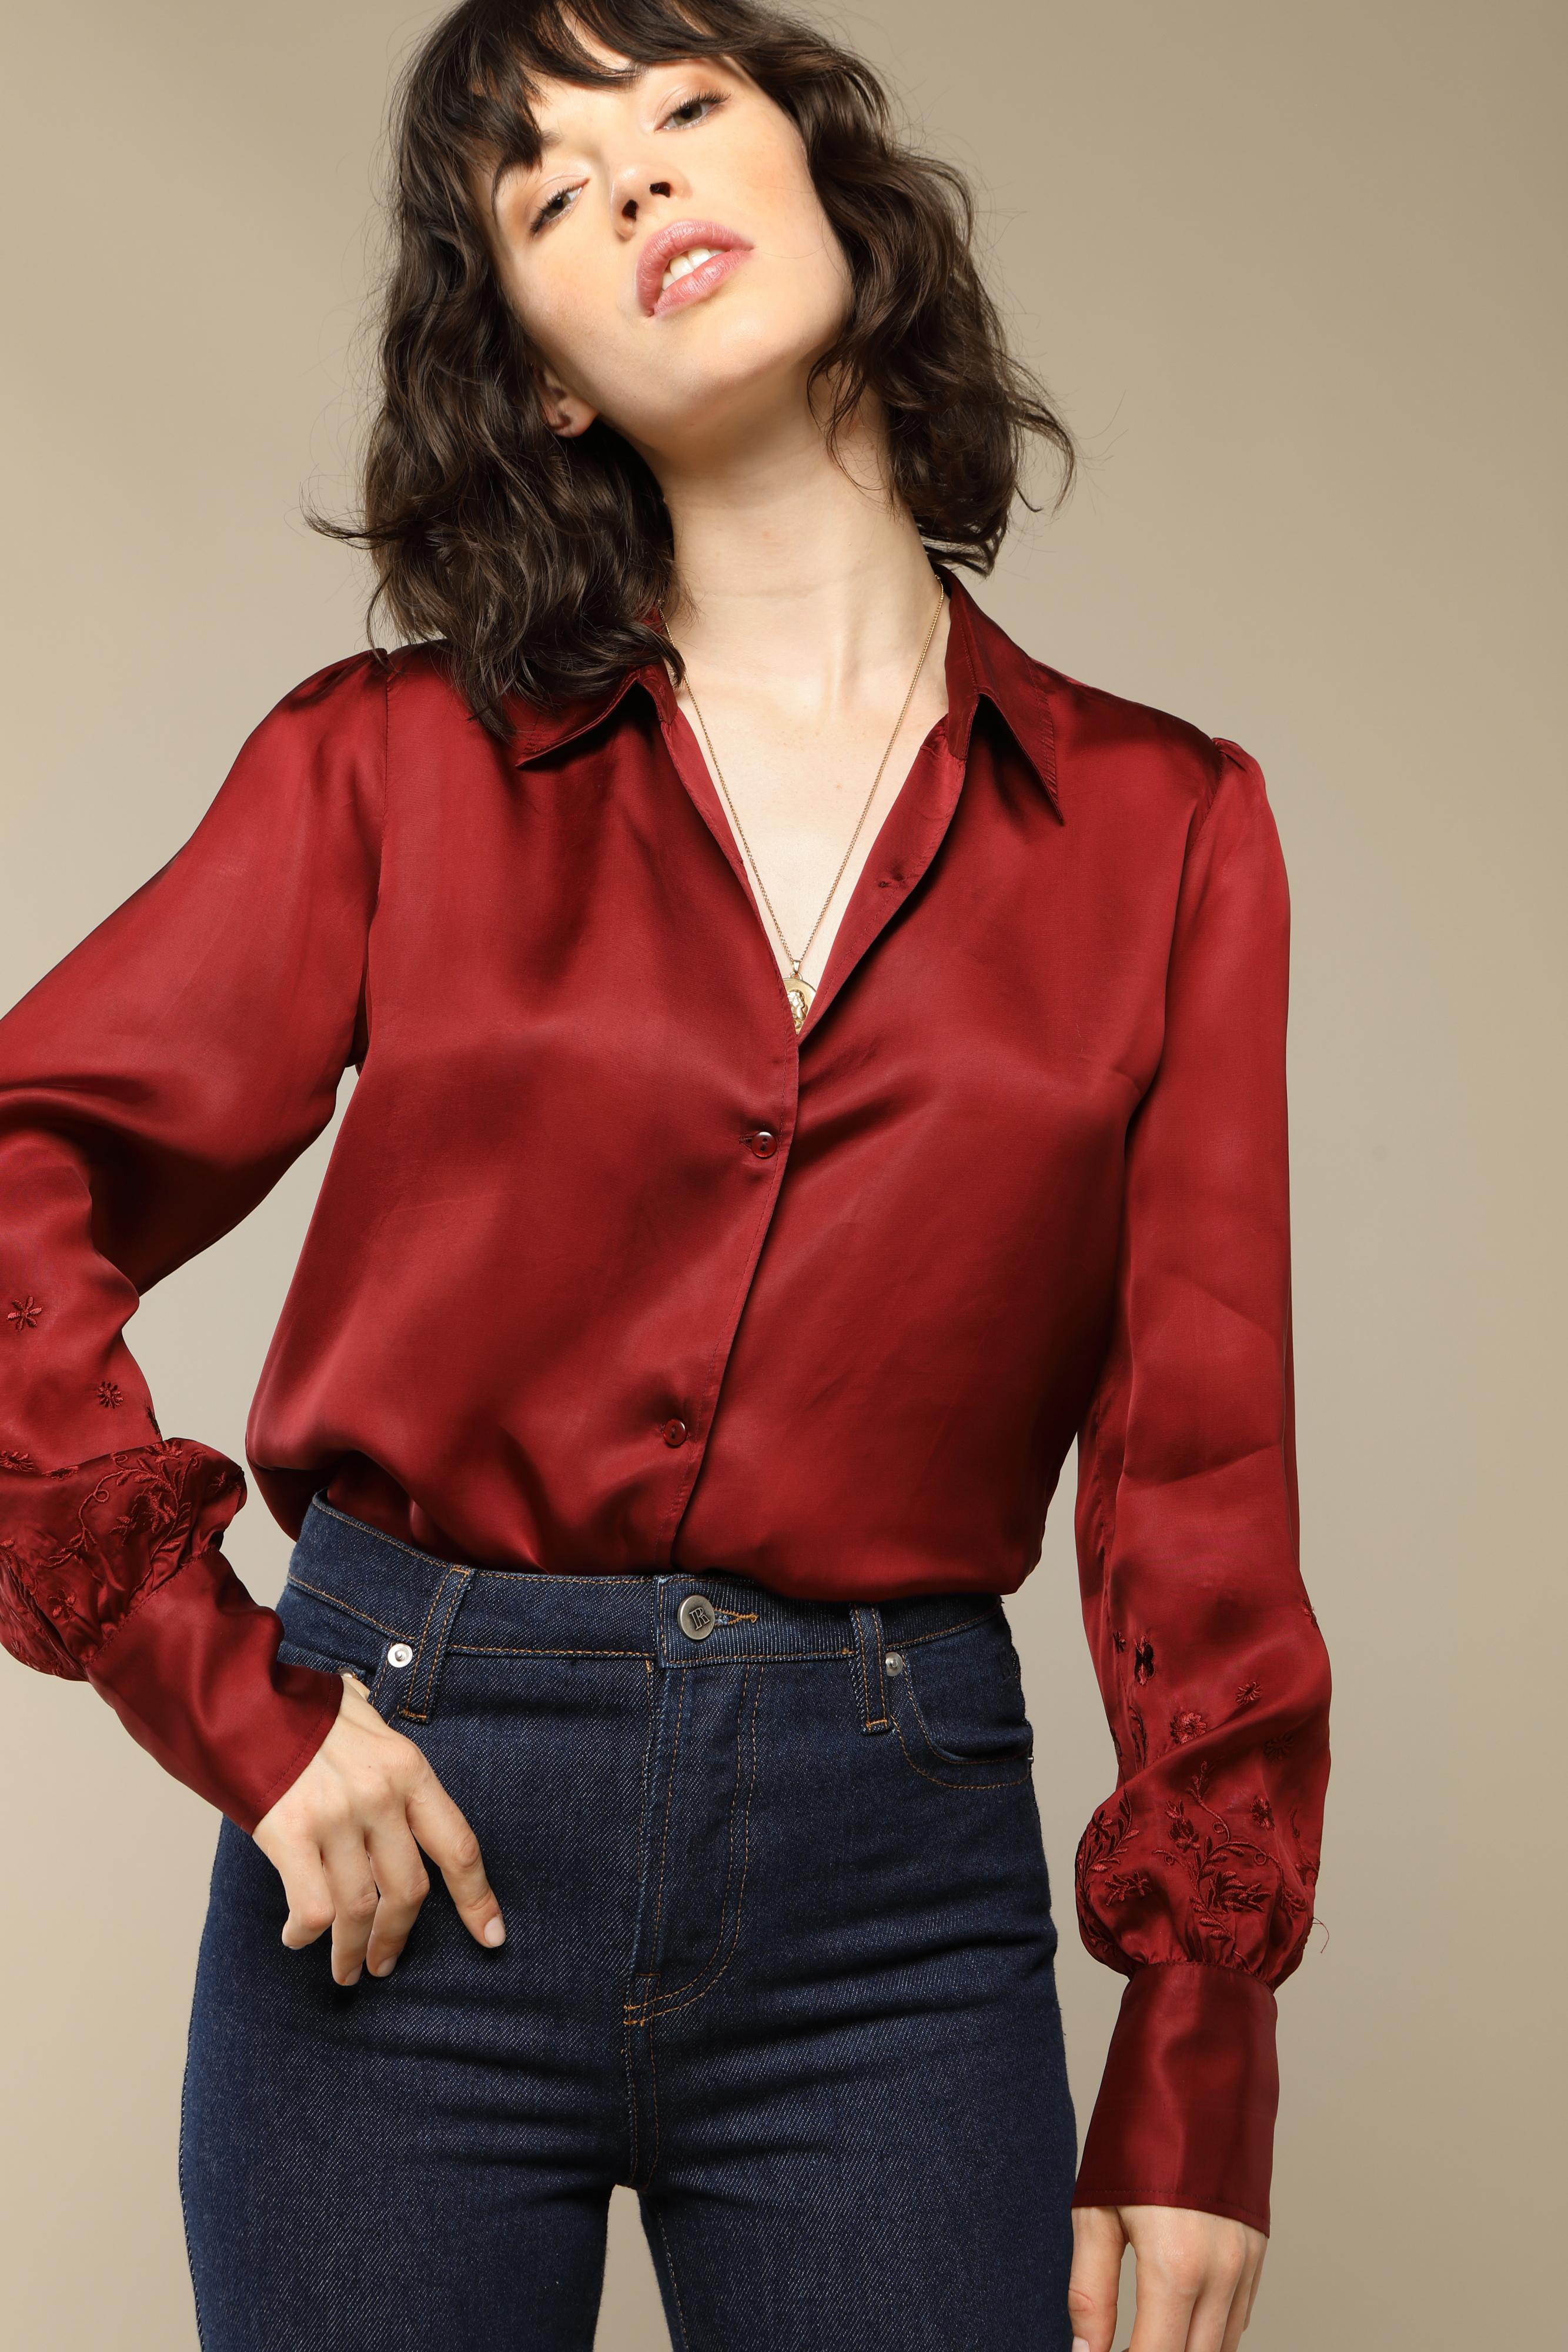 CHLOE shirt in raspberry satin